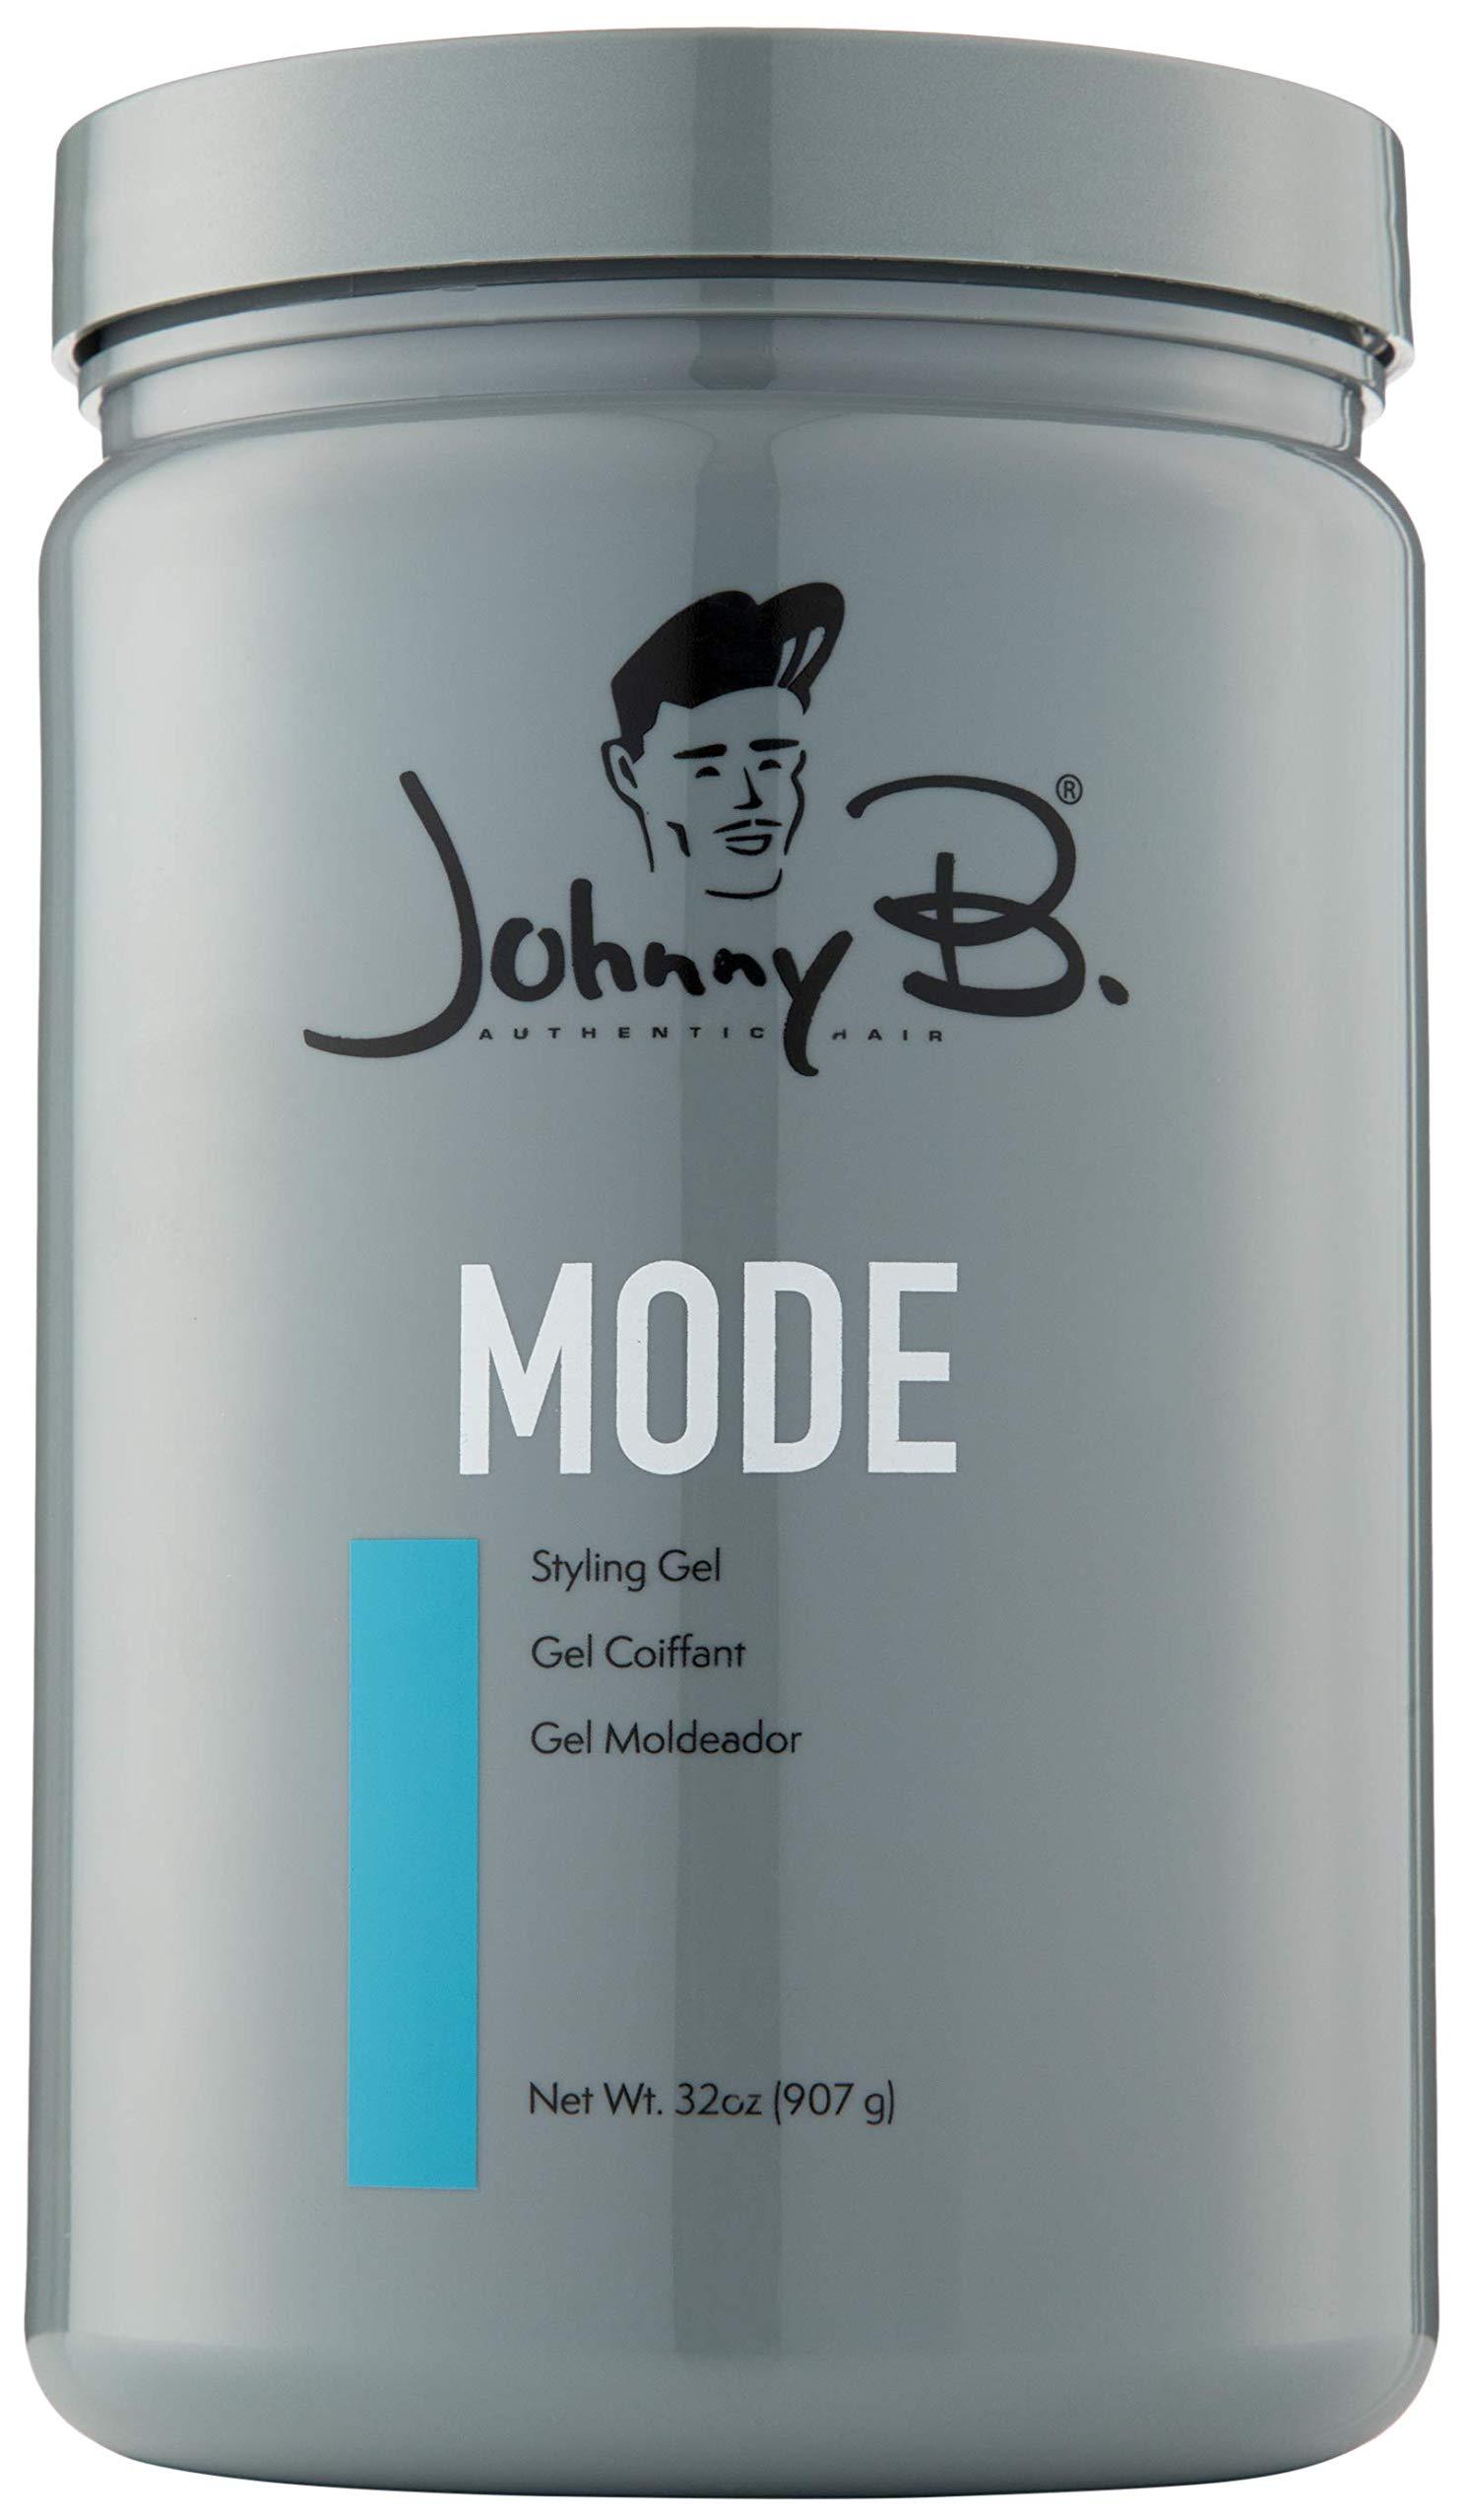 Johnny B Mode Styling Gel (32 ounce)